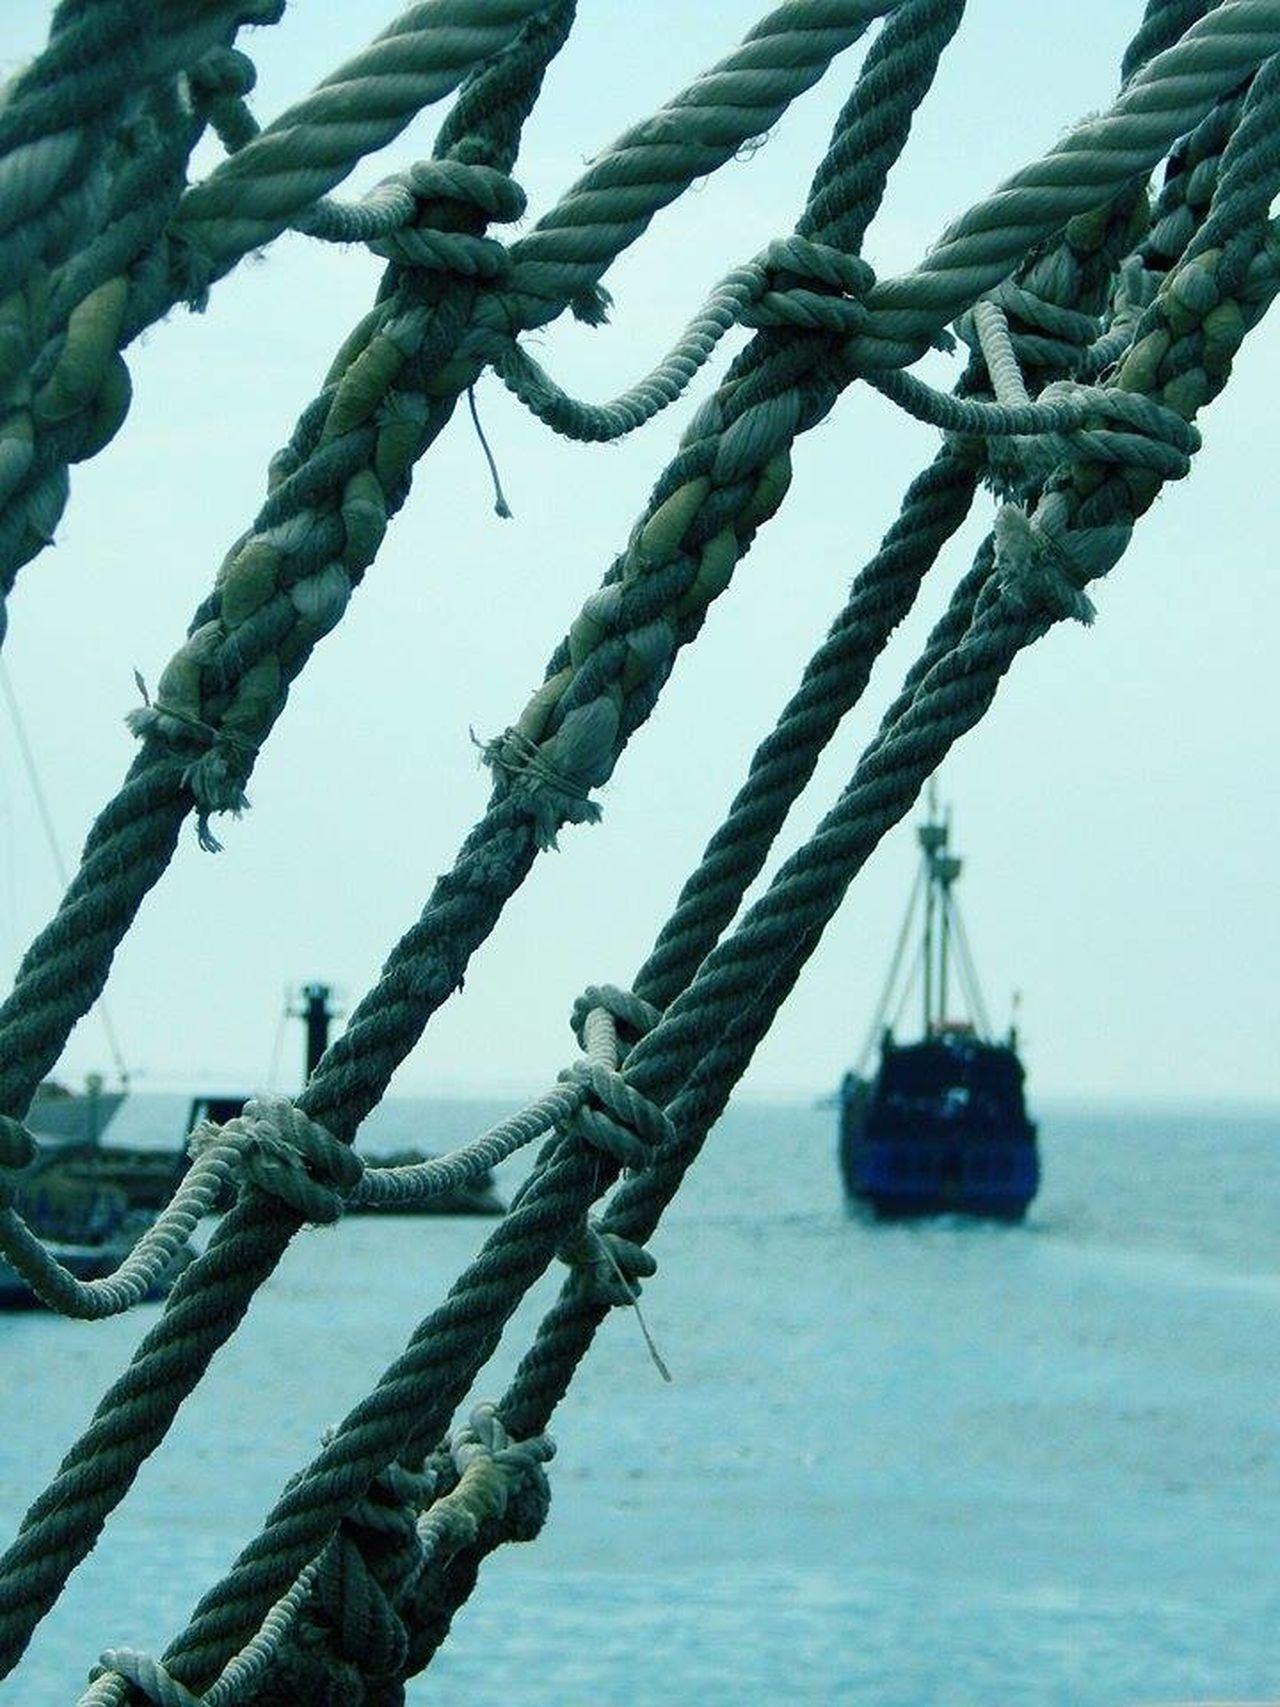 Mediterranean Sea Pirate Pirateship  Sea Sky Tranquility Transportation Water